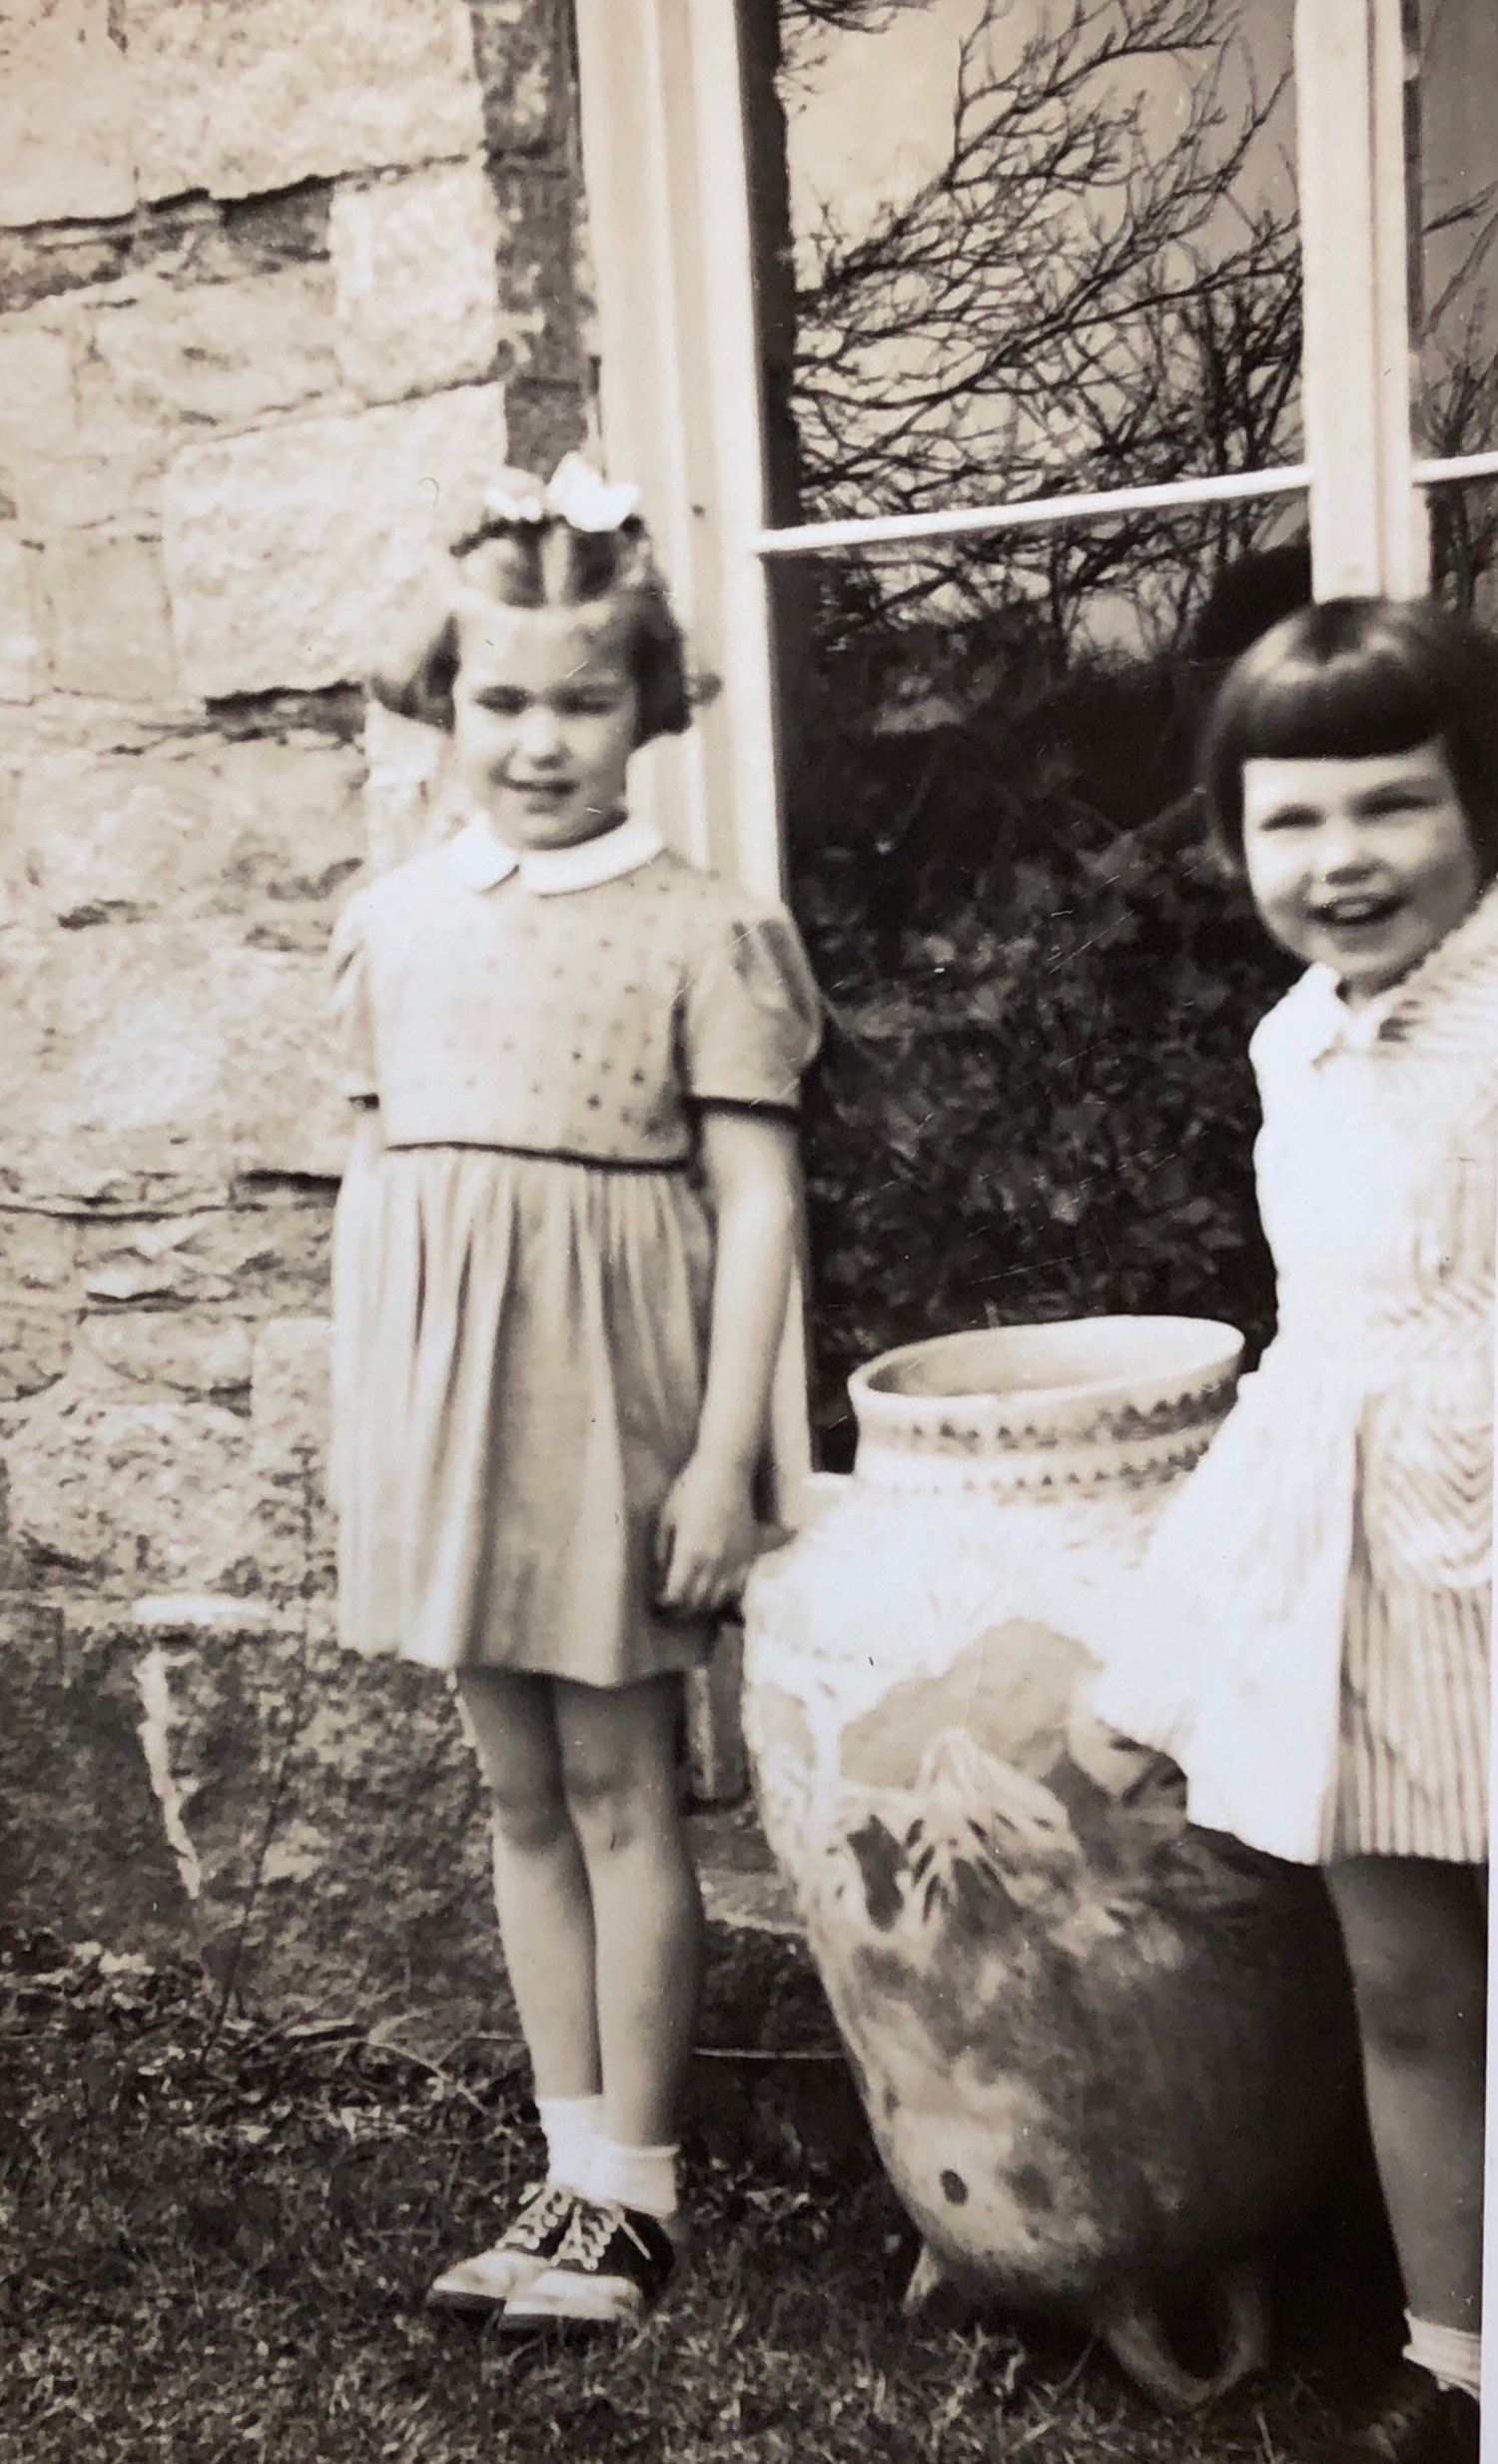 Clare (l) and Tali Burns